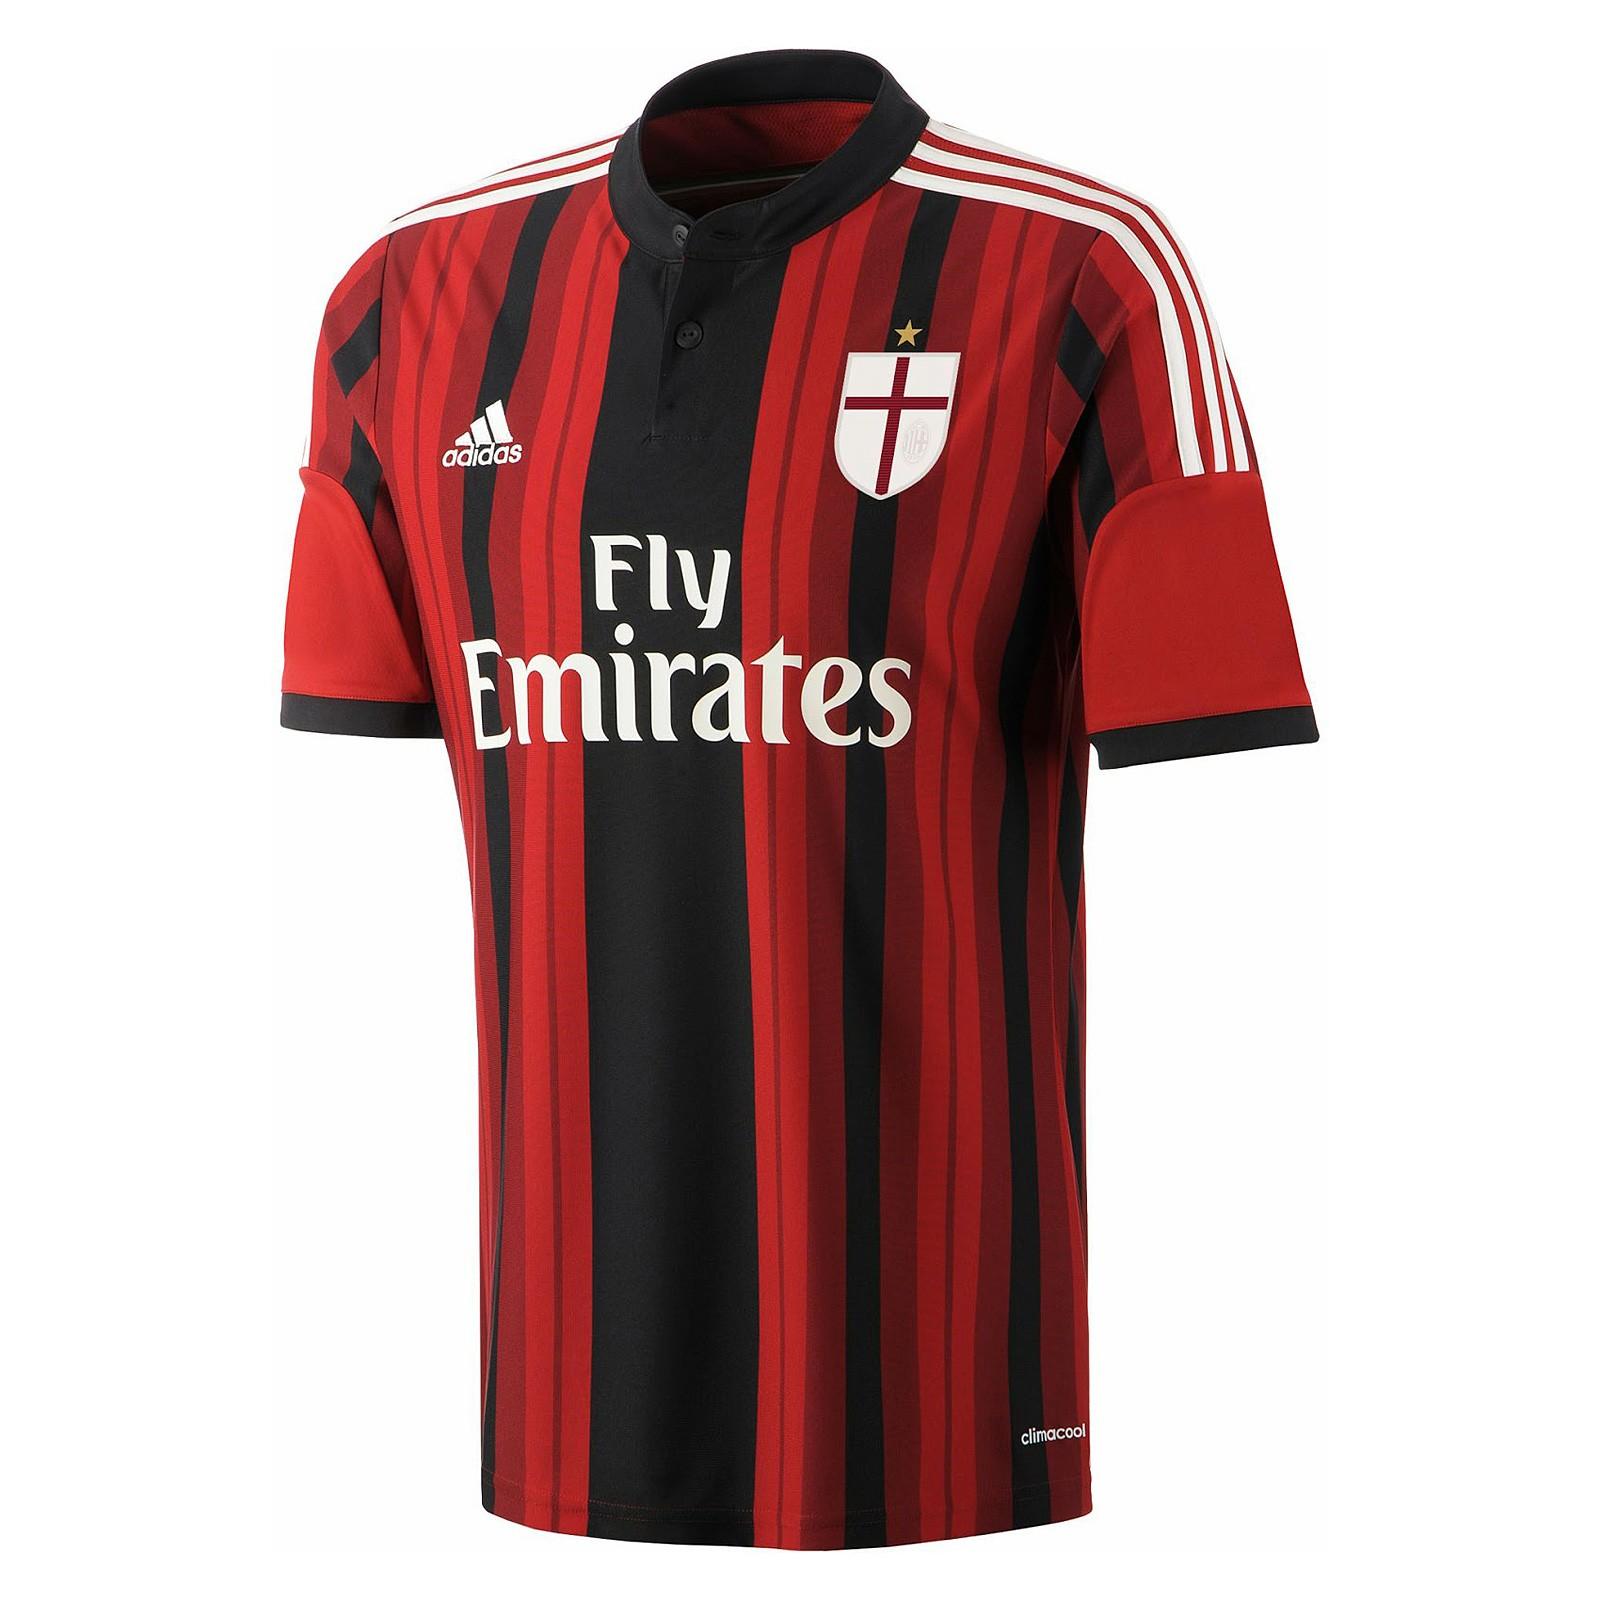 AC米兰2014-15赛季球迷版主场球衣